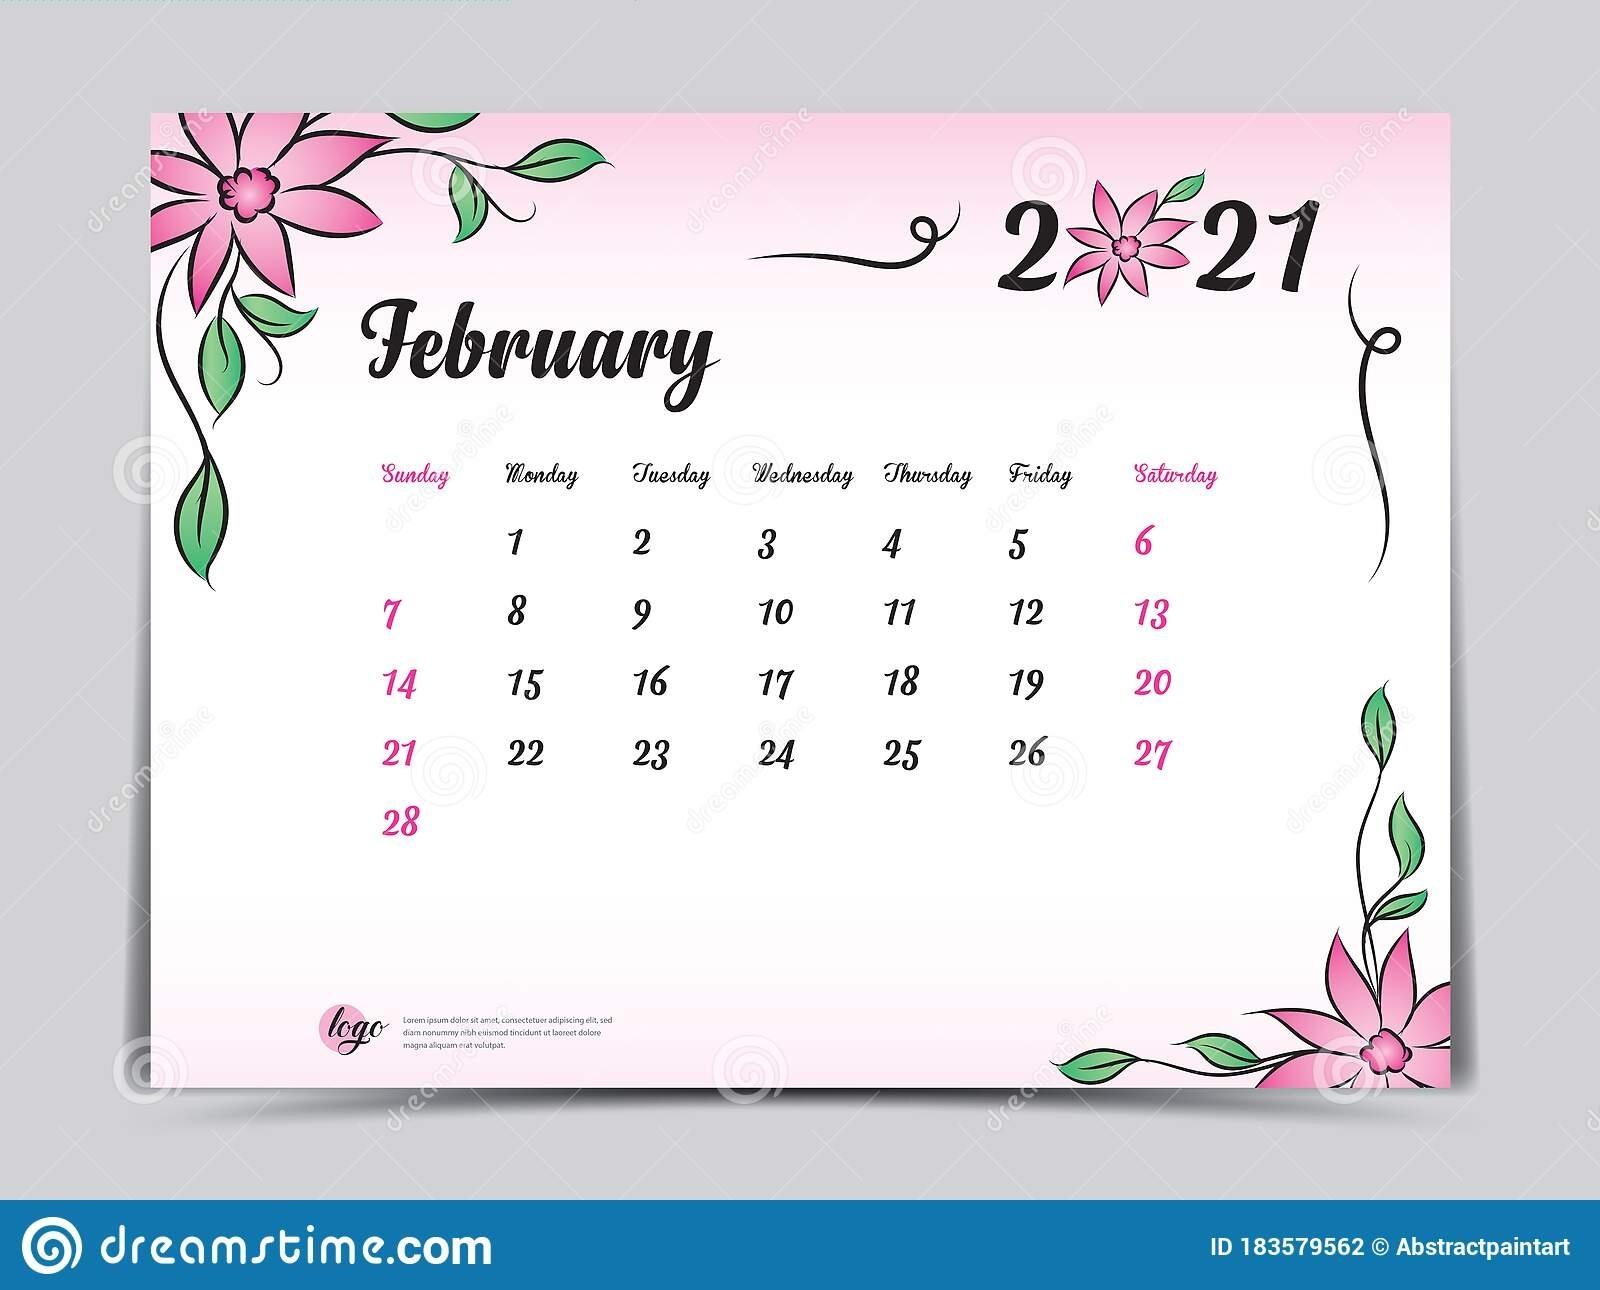 Febuary 2021 Calendar Pink | Empty Calendar August 2021 Calendar Floral